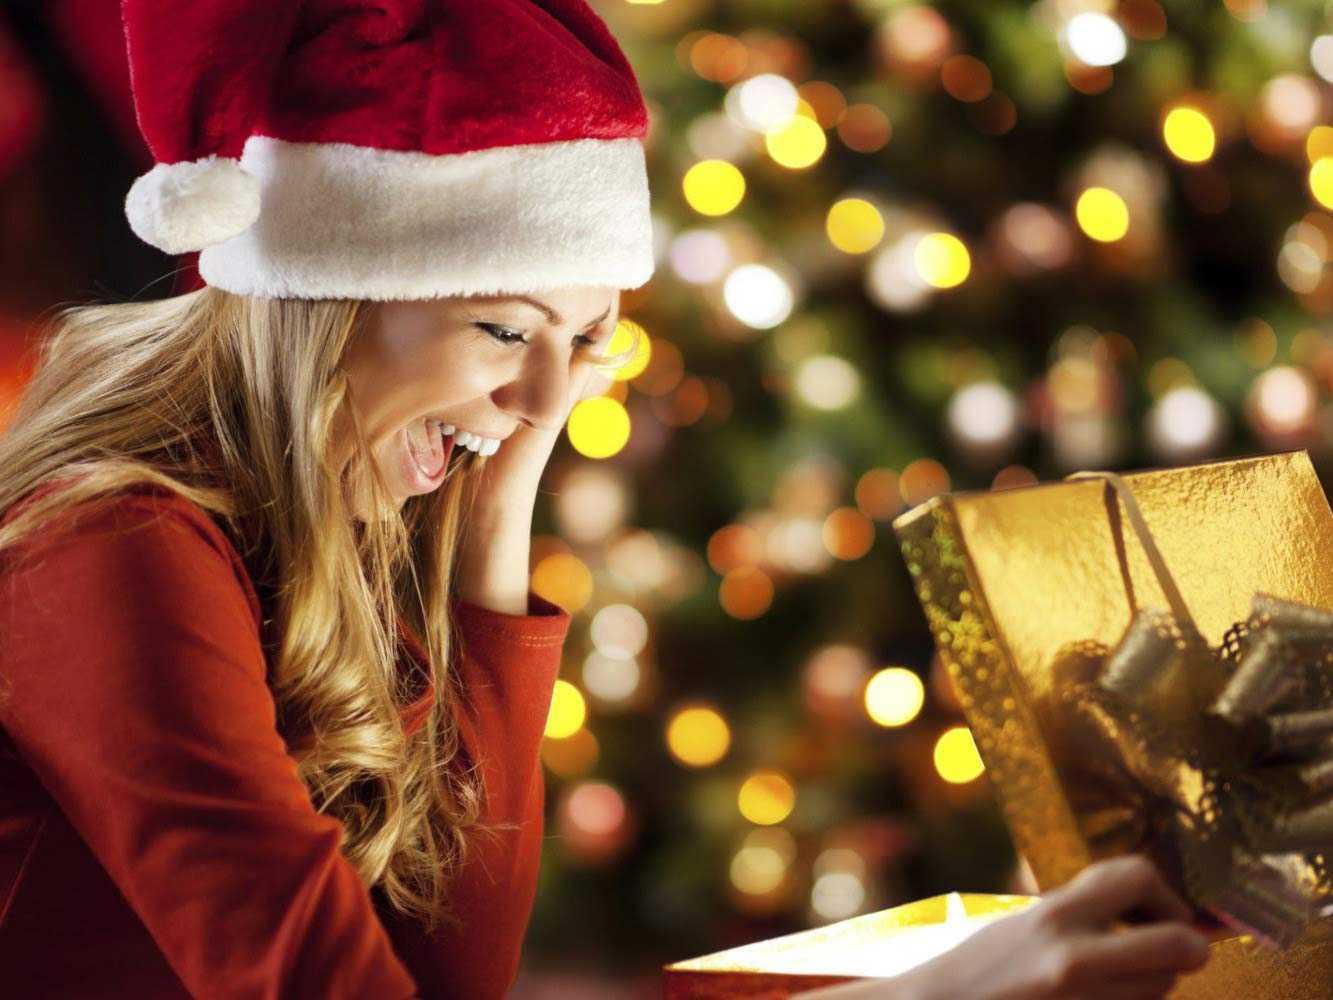 I Migliori Regali Per Natale.Top 10 I Migliori Regali Di Natale Per Lei